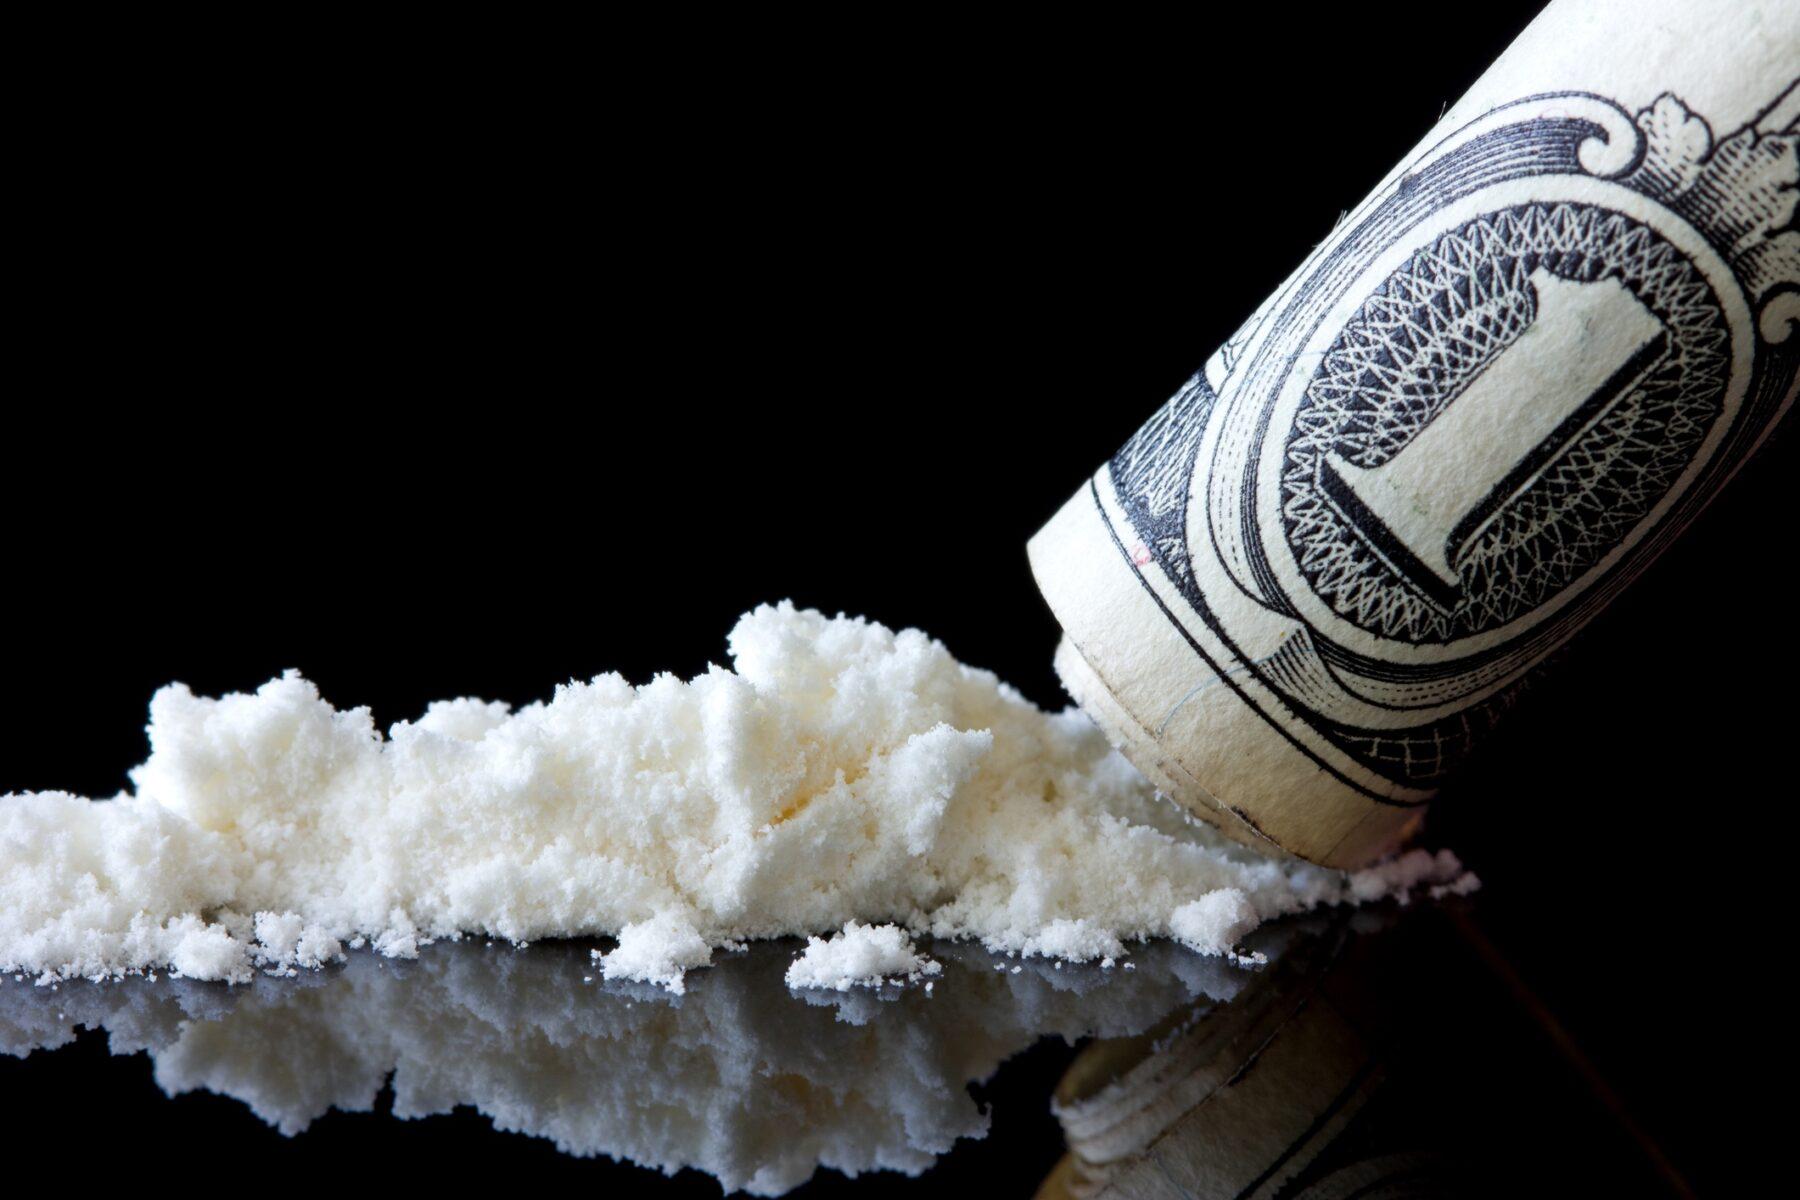 cocaine and ice